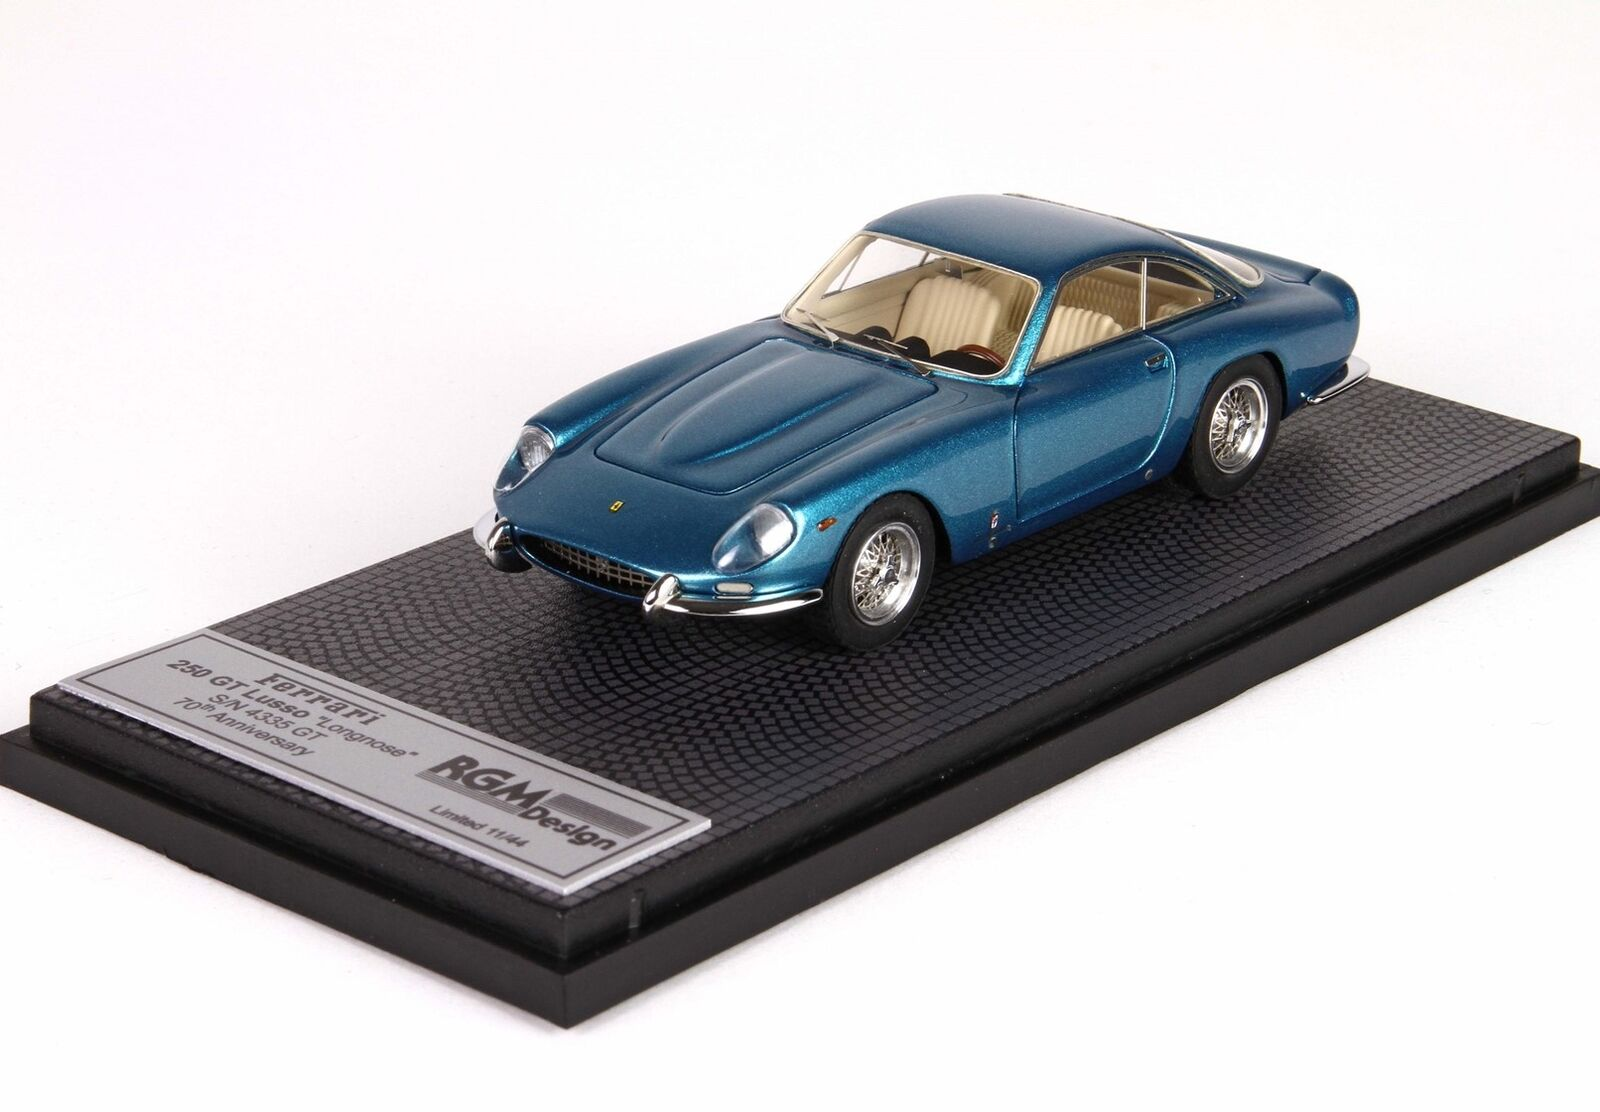 Ferrari 250 Gt Lusso Longnose 1964 70Th Anniversary S N4335Gt BBR 1 43 RGM15-8